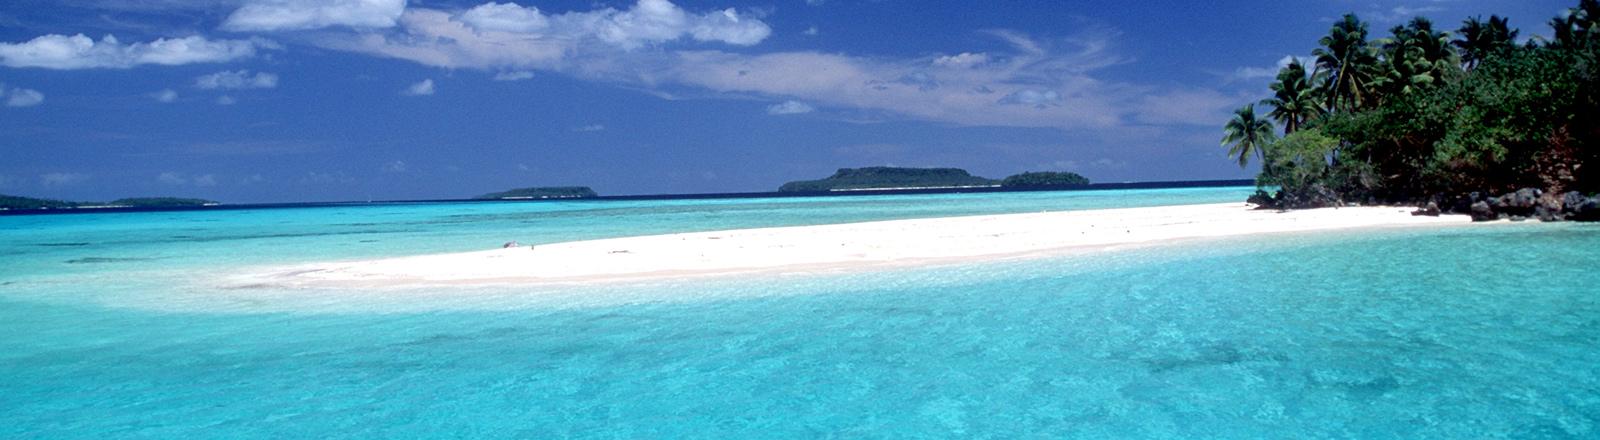 Strand in türkisfarbenem Wasser